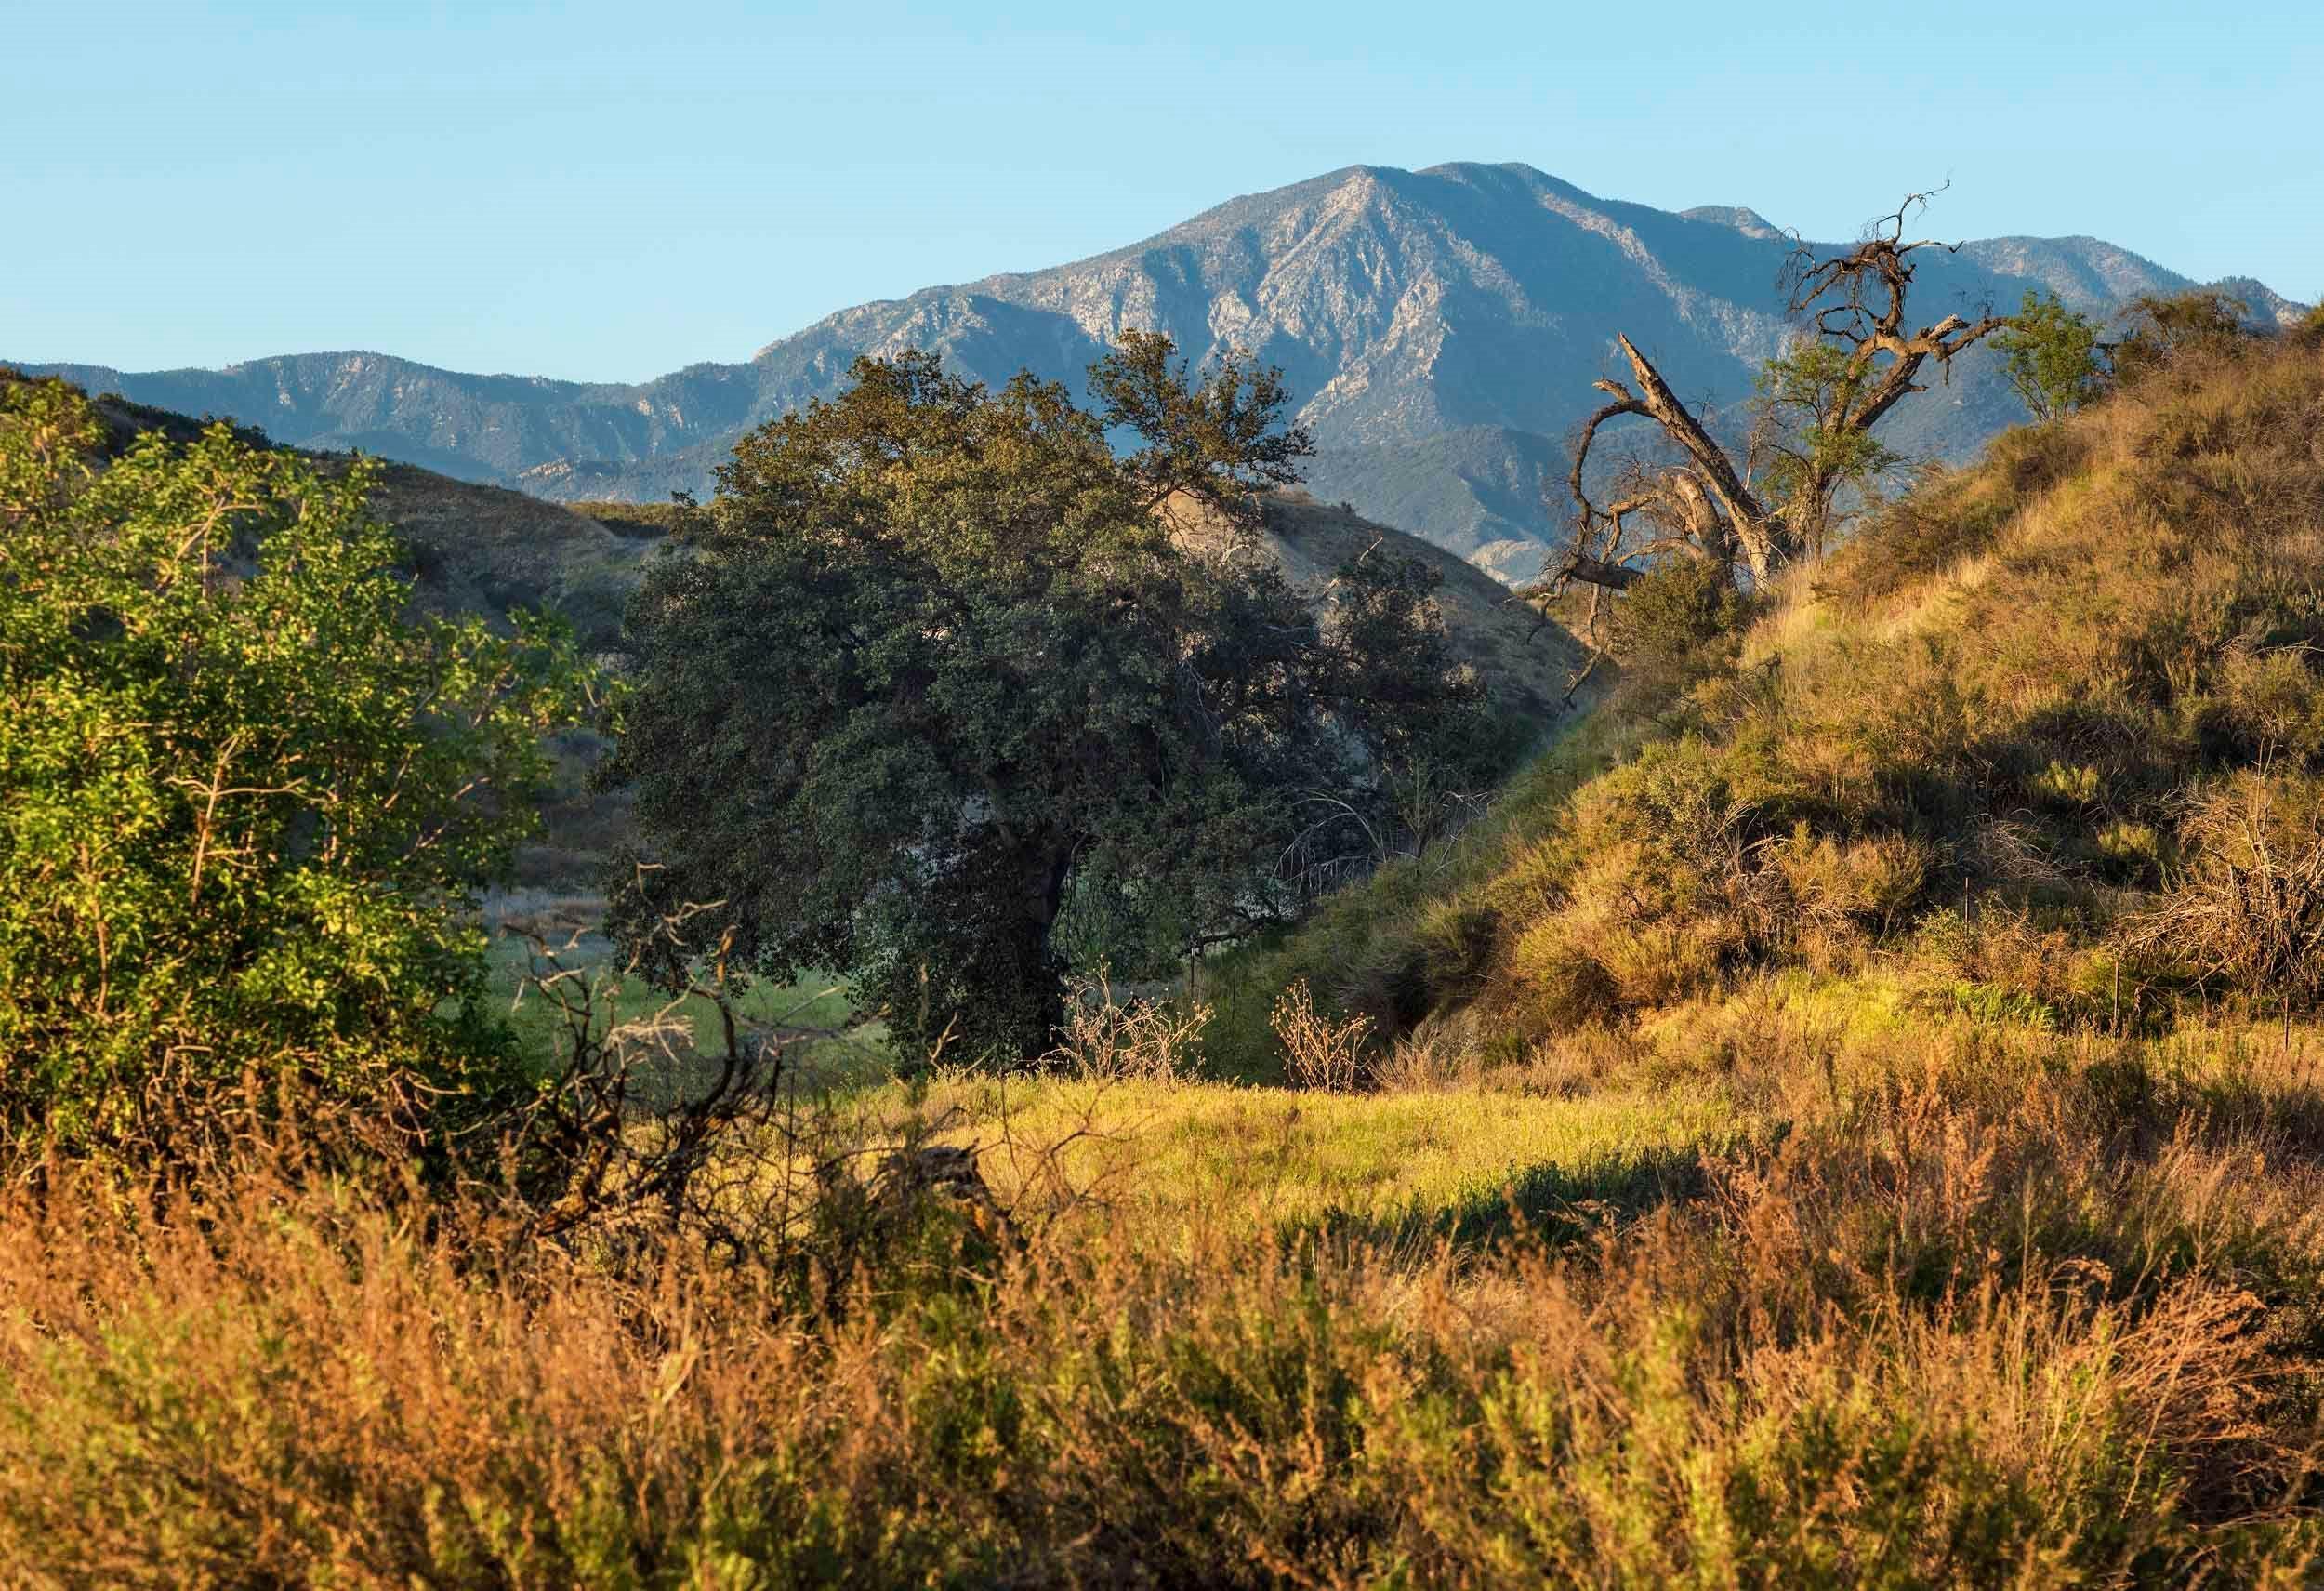 'Summerwind Trails - Wildflower' by Lennar - Inland Empire in Riverside-San Bernardino